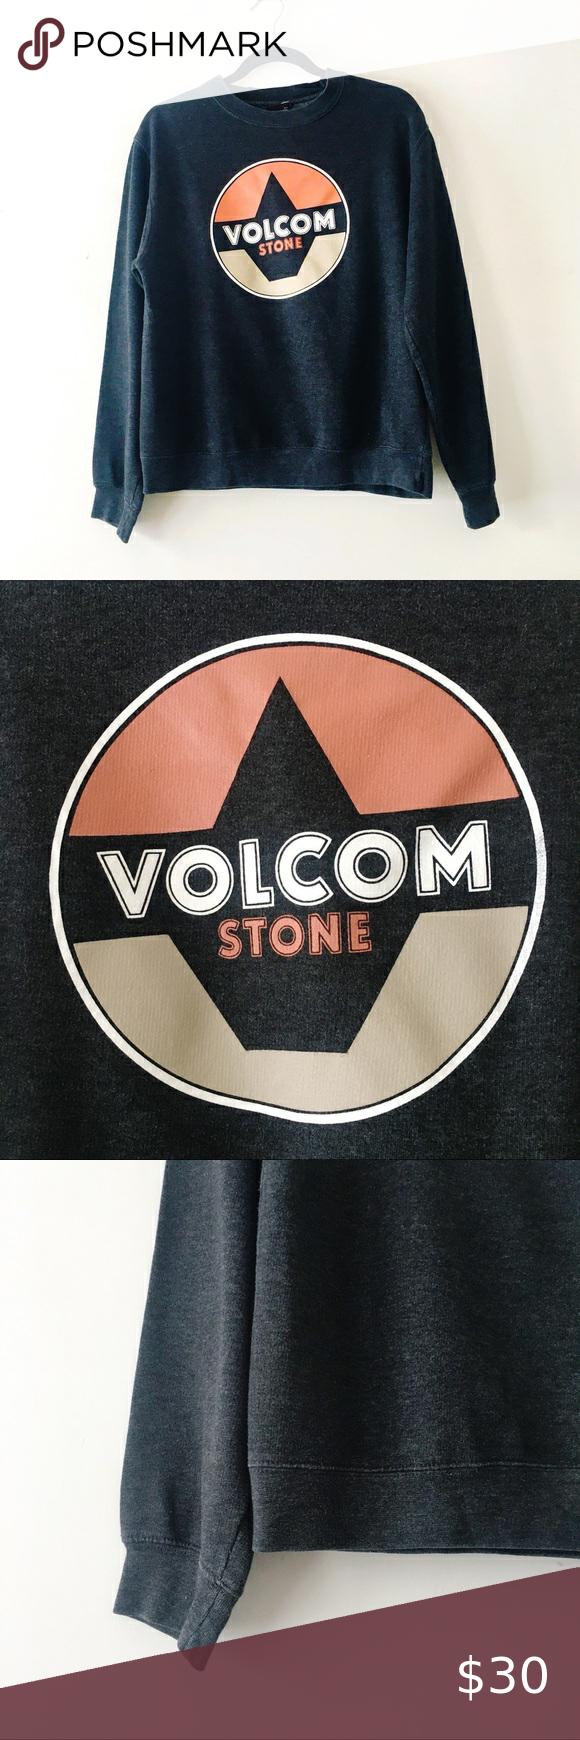 Volcom Stone Dark Gray Crewneck Sweatshirt In 2021 Crew Neck Sweatshirt Sweatshirts Volcom [ 1740 x 580 Pixel ]